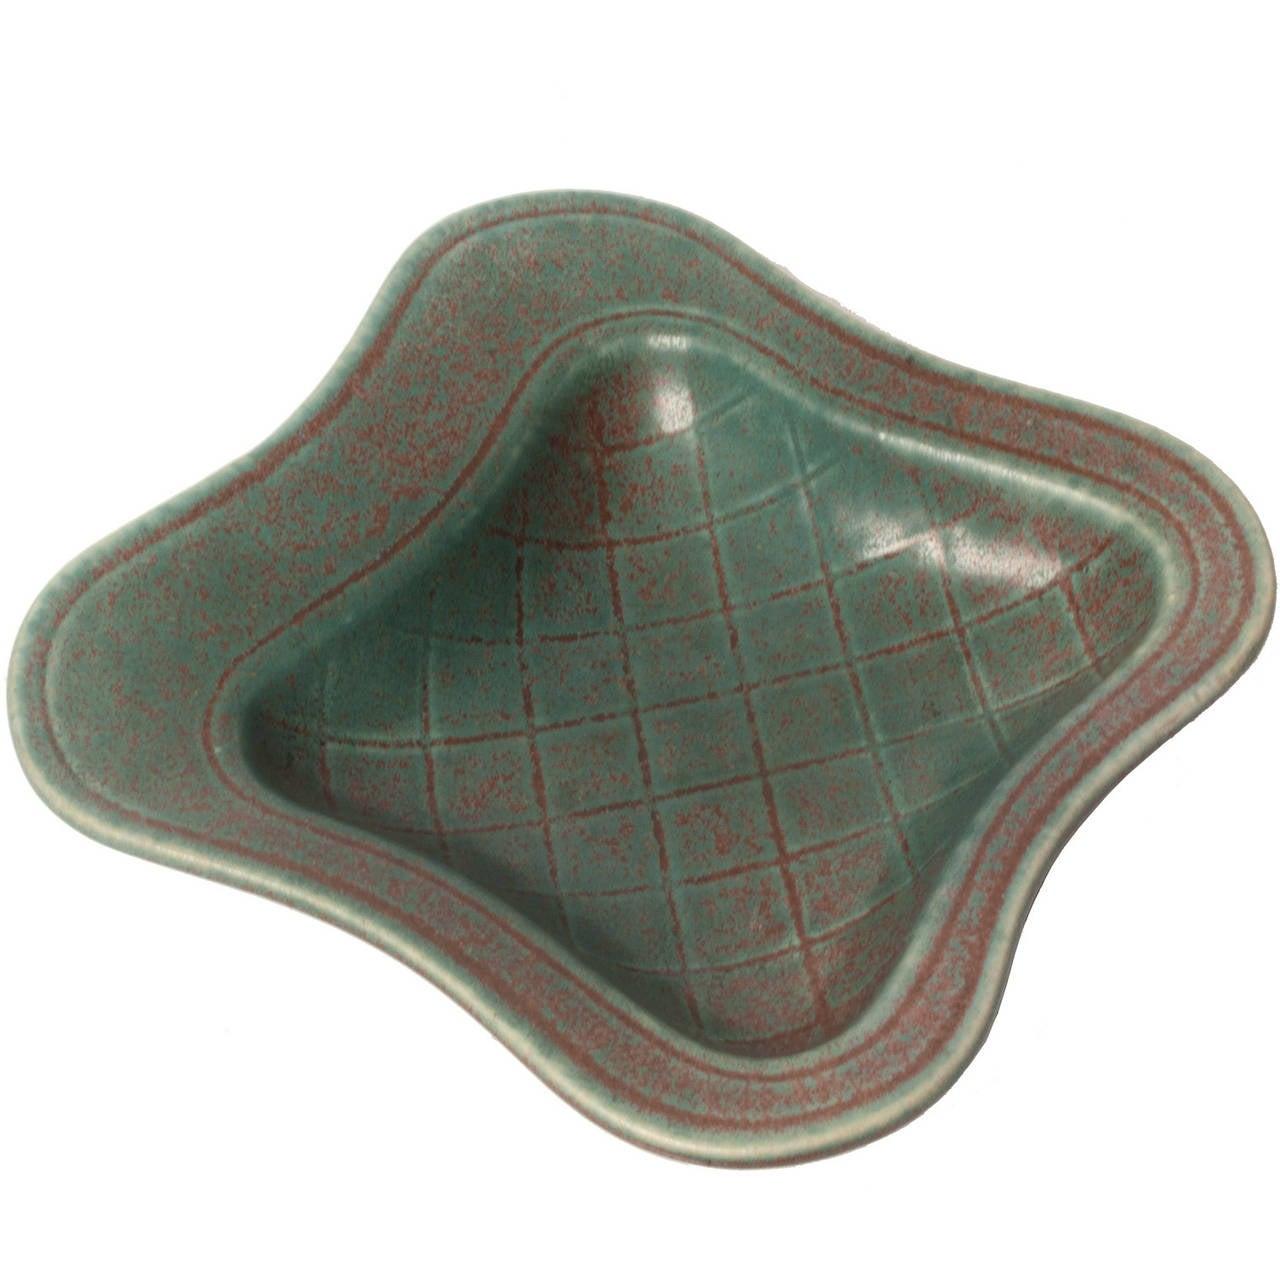 Scandinavian Modern Ceramic Organic Form Bowl by Gunnar Nylund, Rorstrand